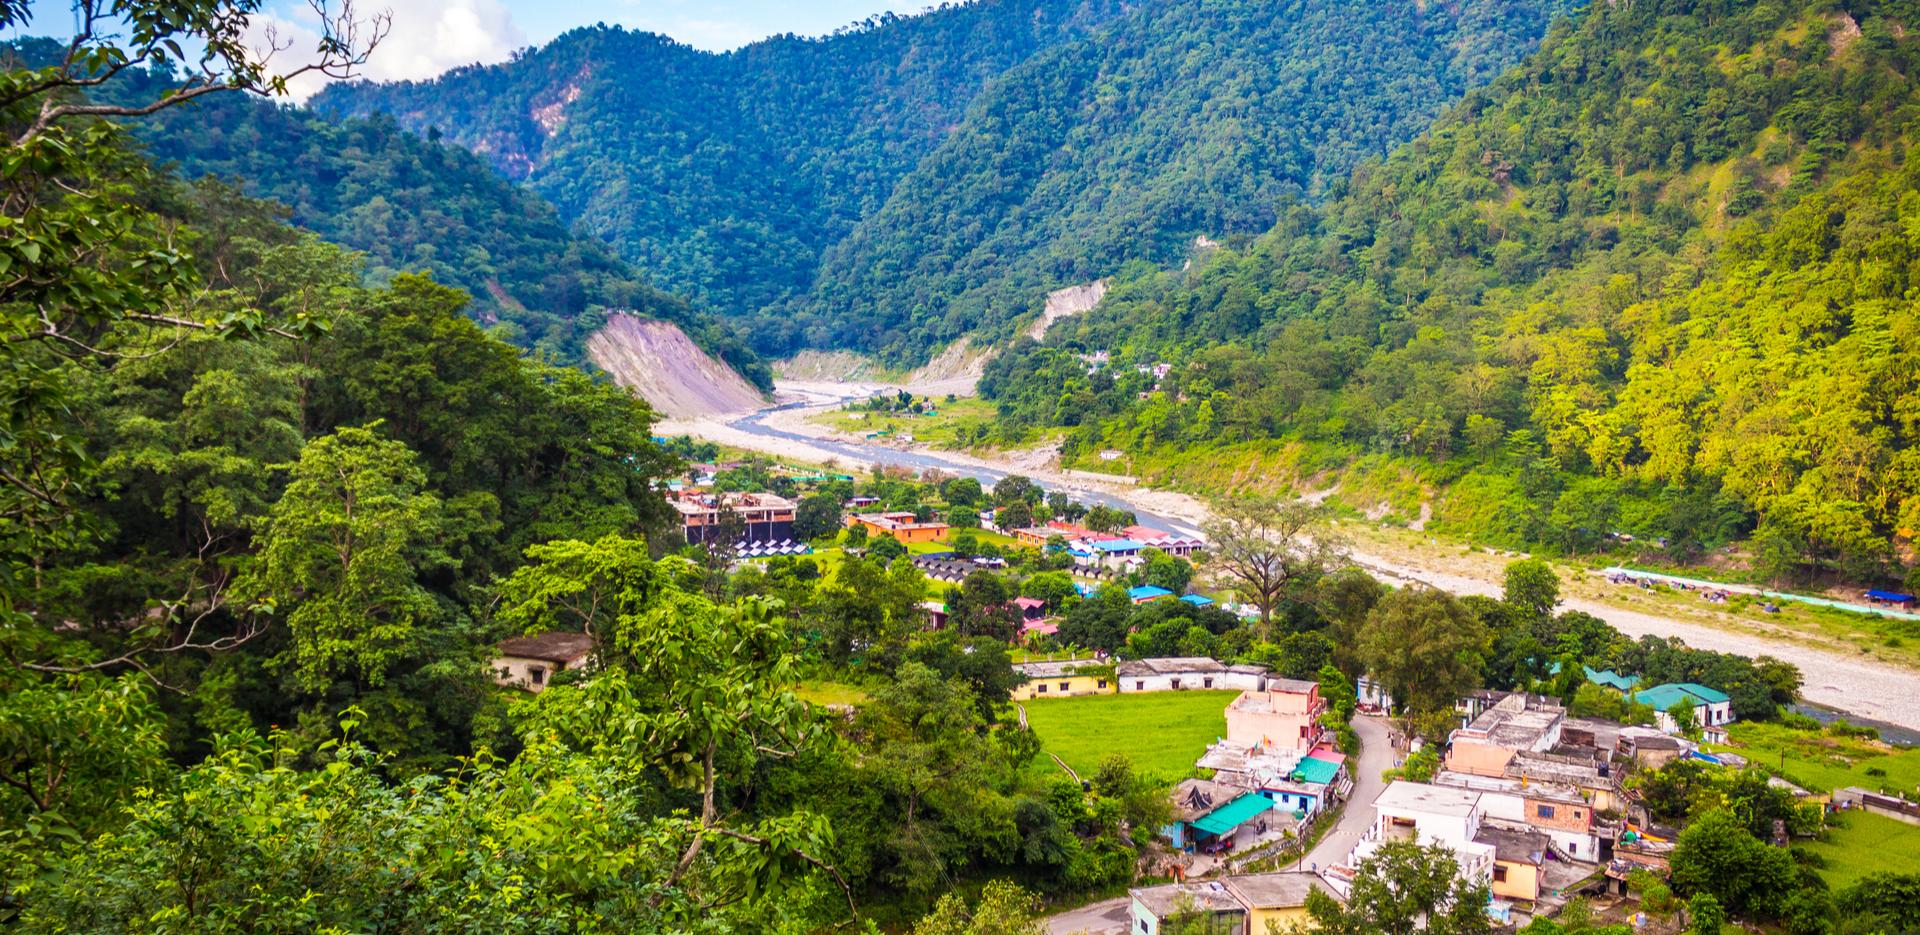 Club Mahindra Uttarakhand Resorts